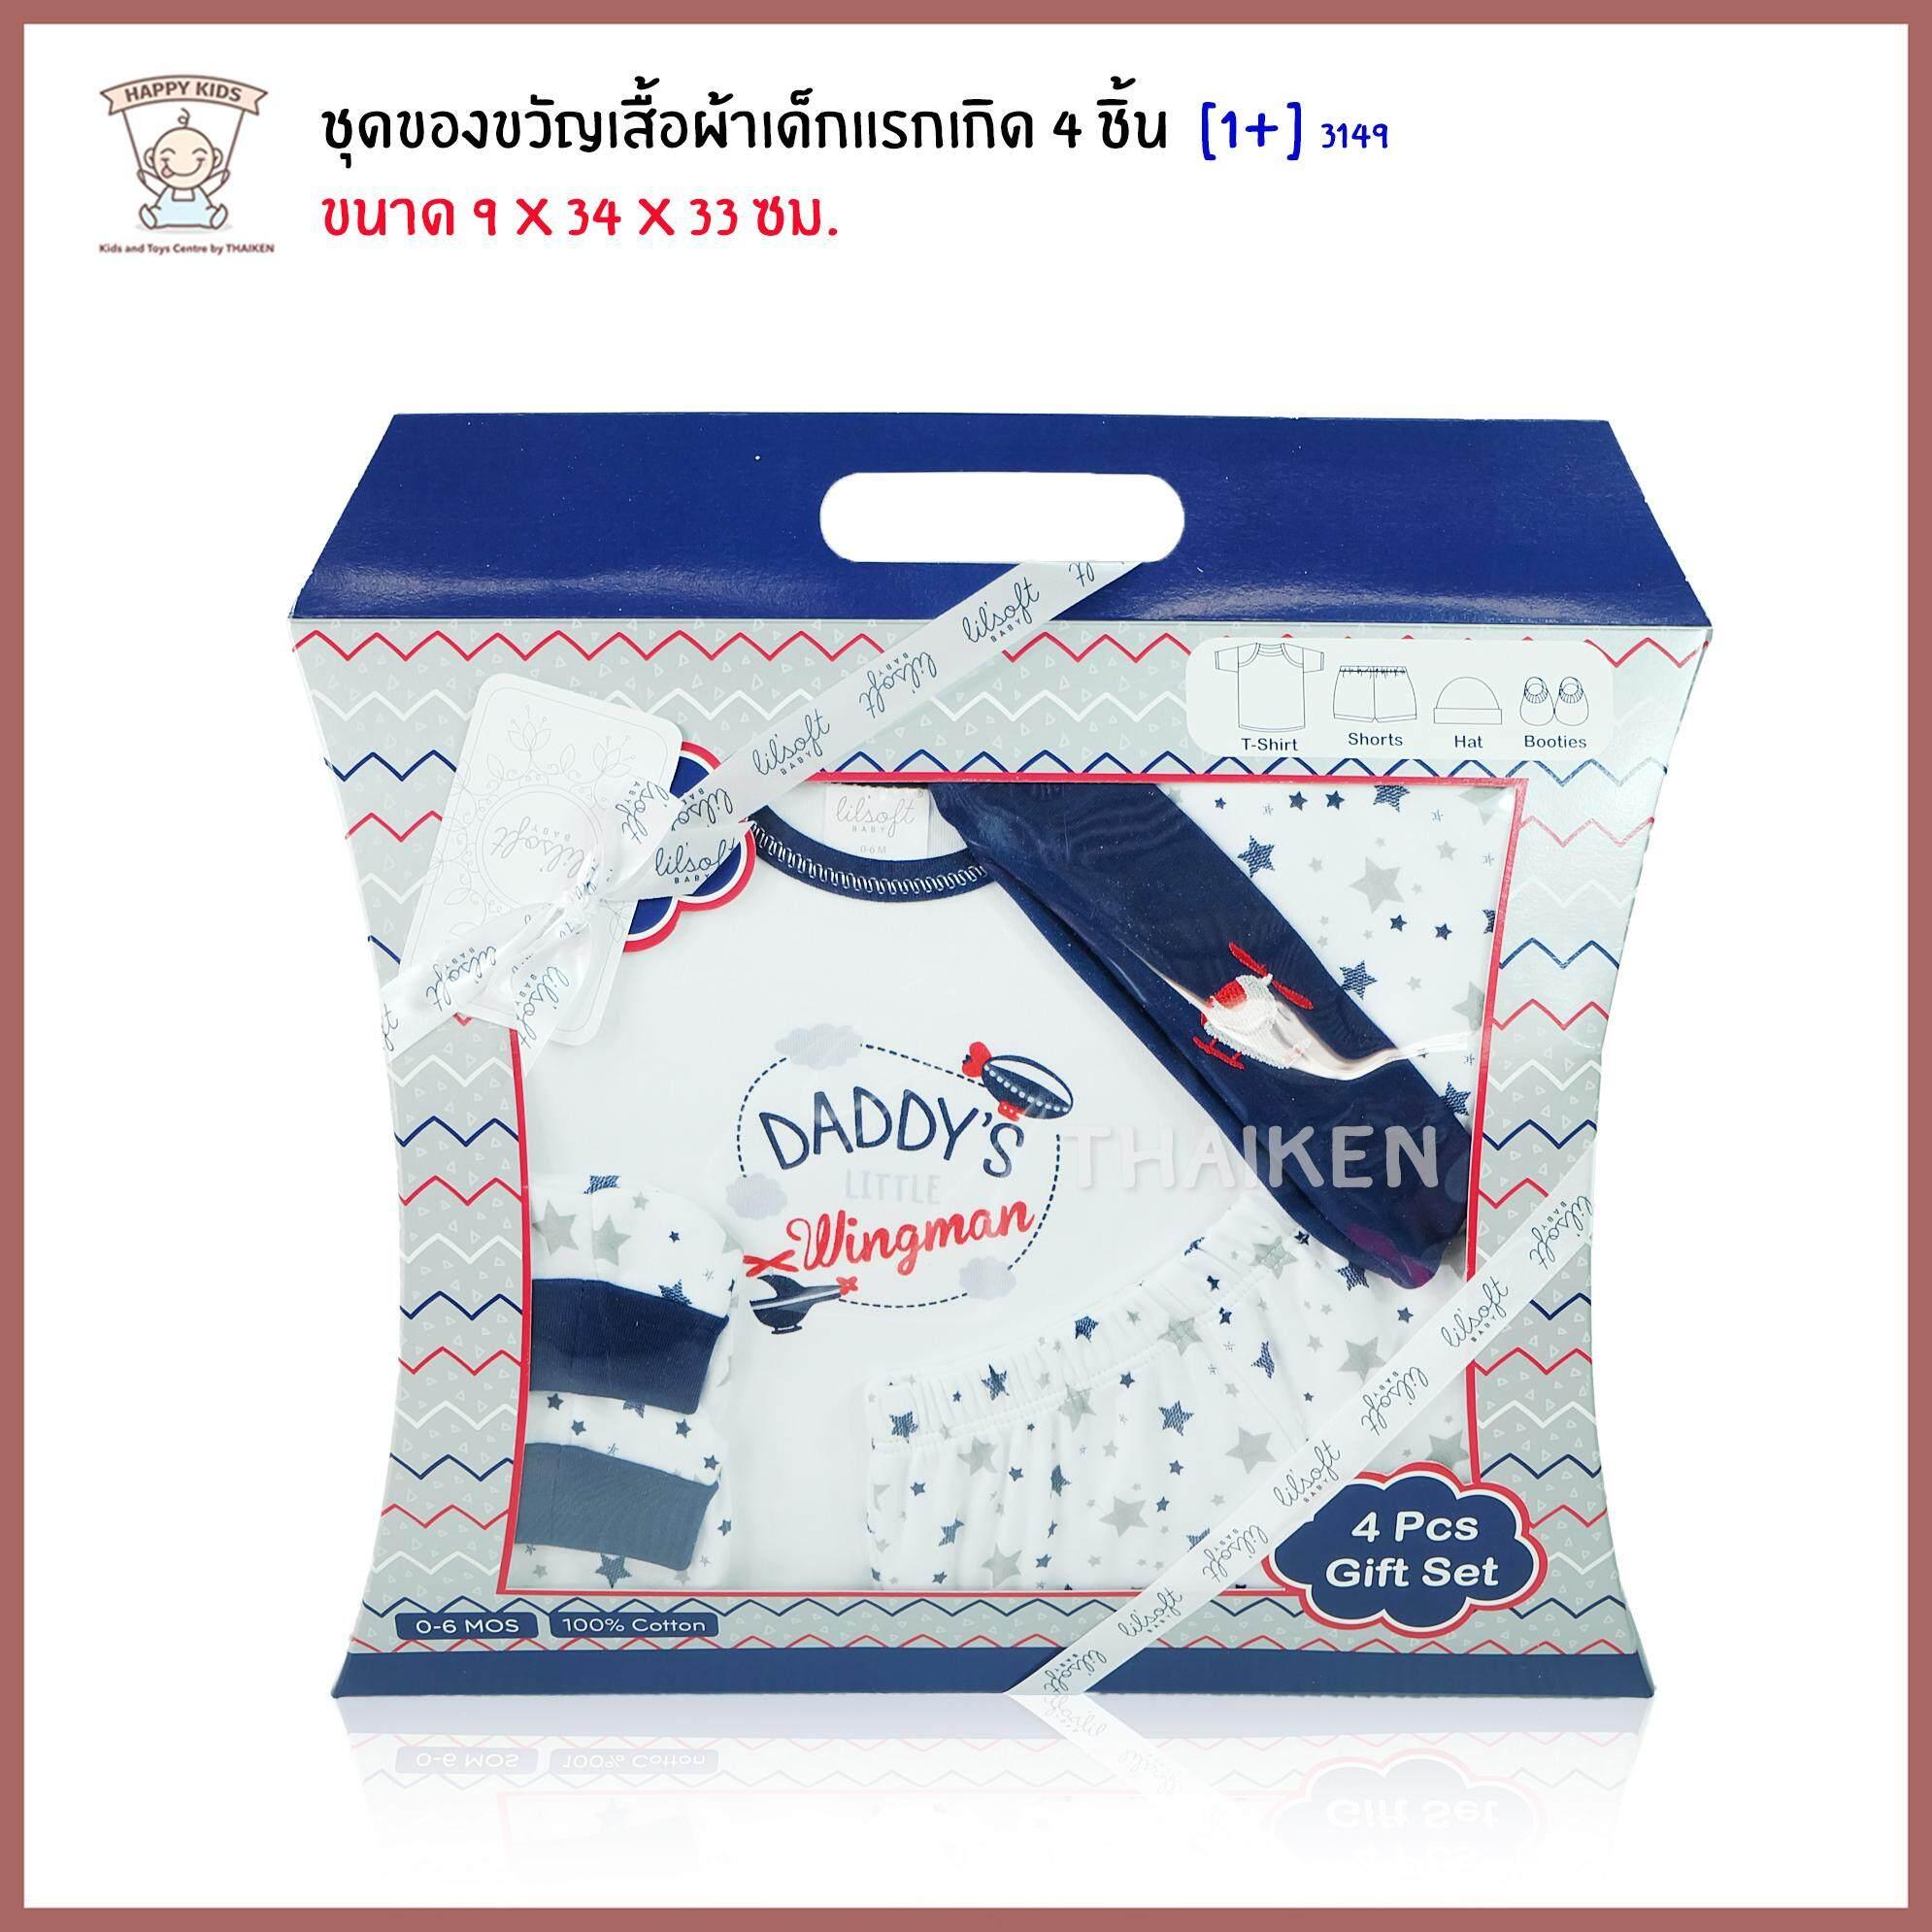 Thaiken ชุดของขวัญเสื้อผ้าเด็กแรกเกิด 4 ชิ้น 3149 By Thaiken.